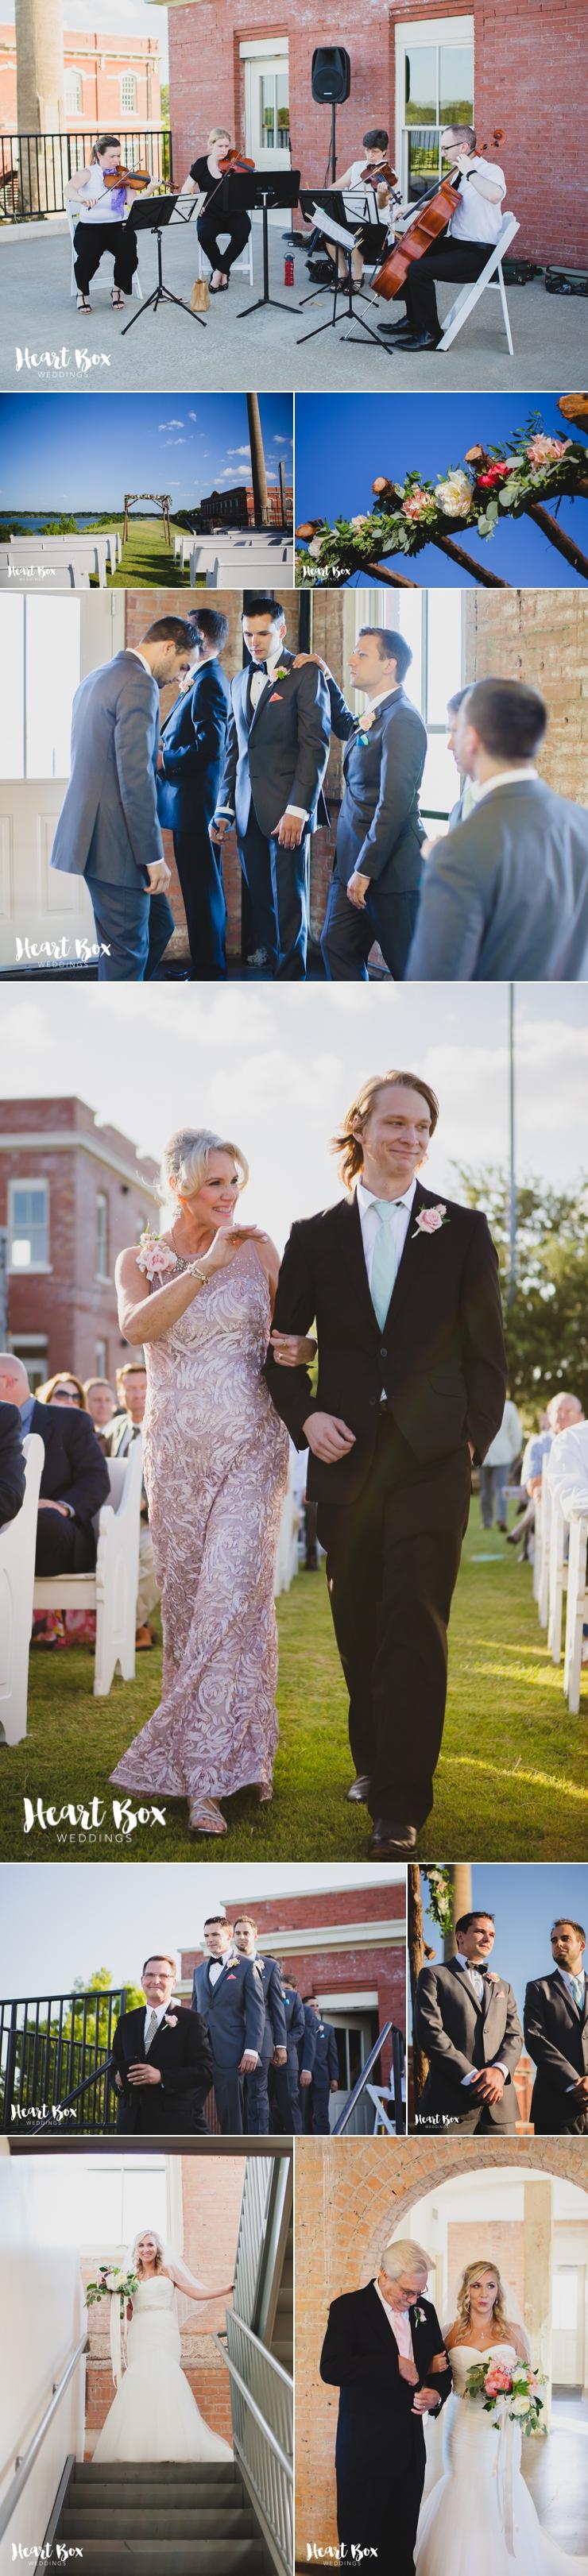 Gould Wedding Blog Collages 11.jpg